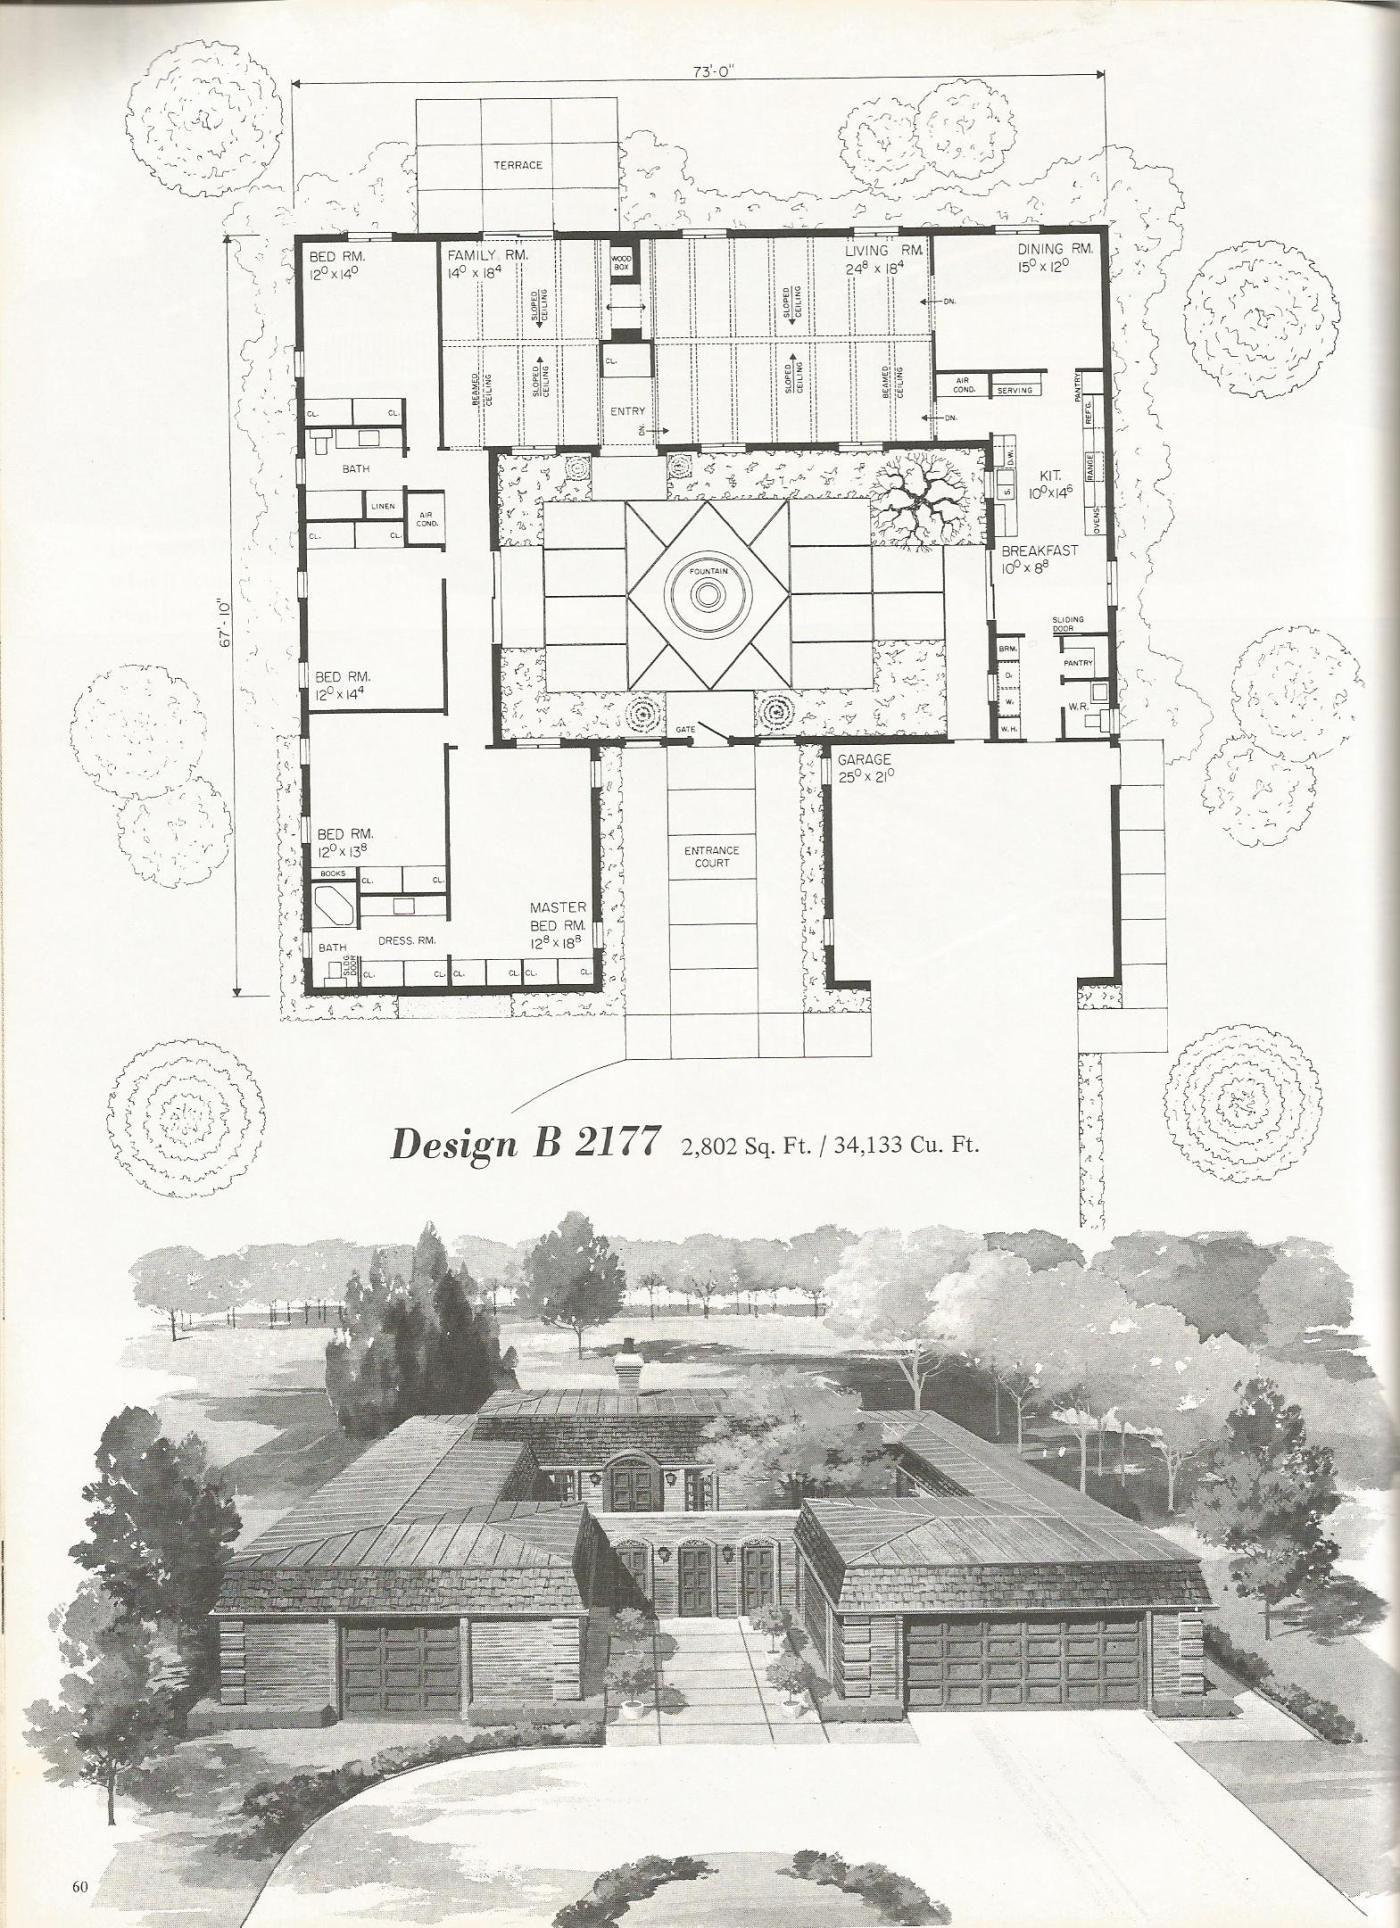 vintage house plans, mid century homes, luxurious vintage home